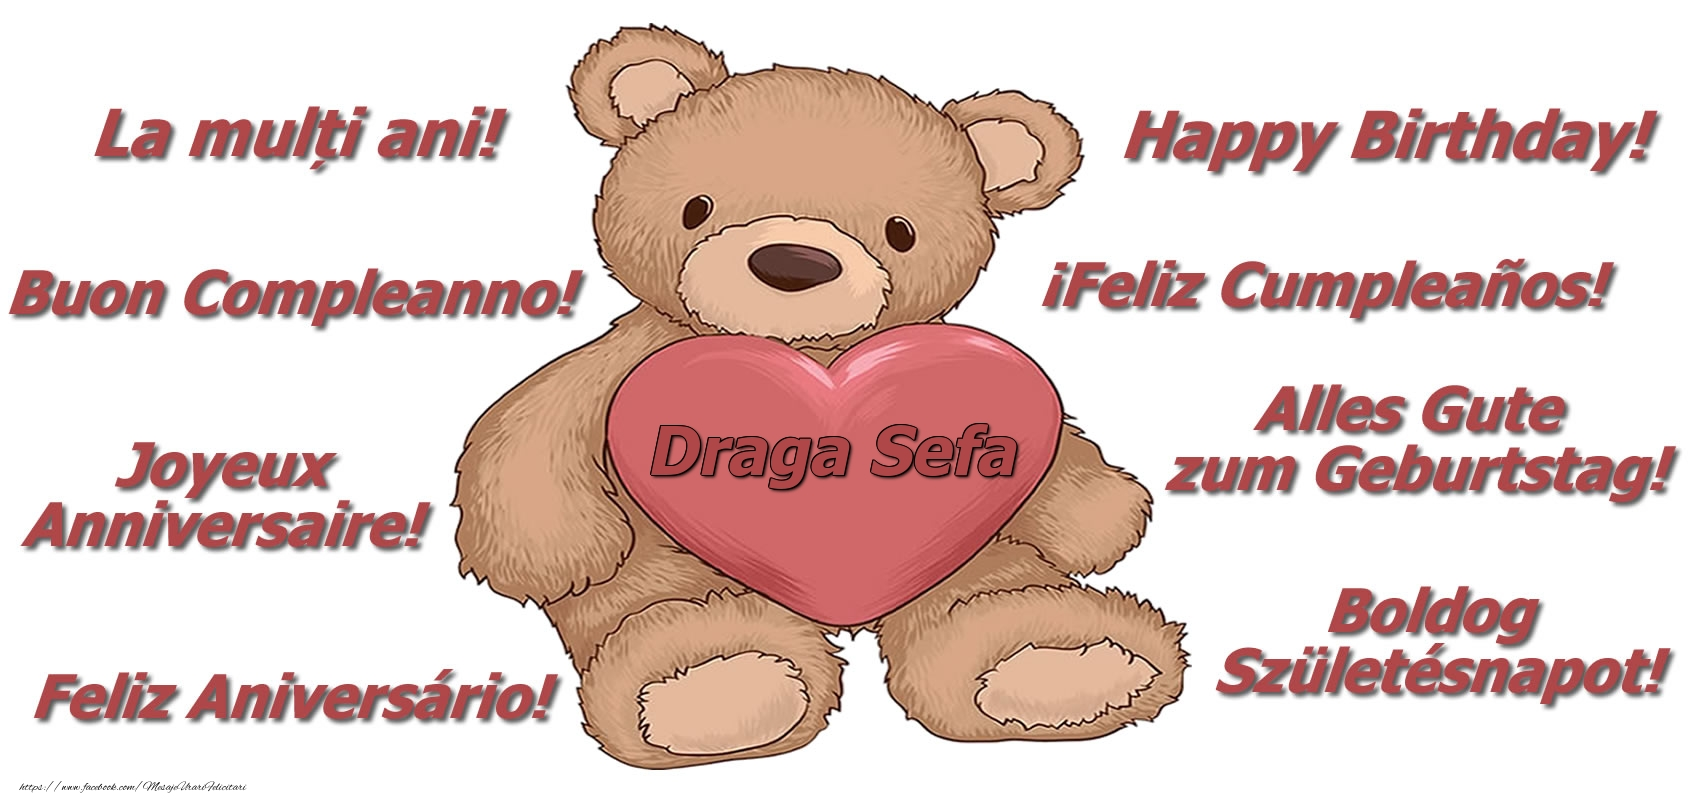 Felicitari de zi de nastere pentru Sefa - La multi ani draga sefa! - Ursulet